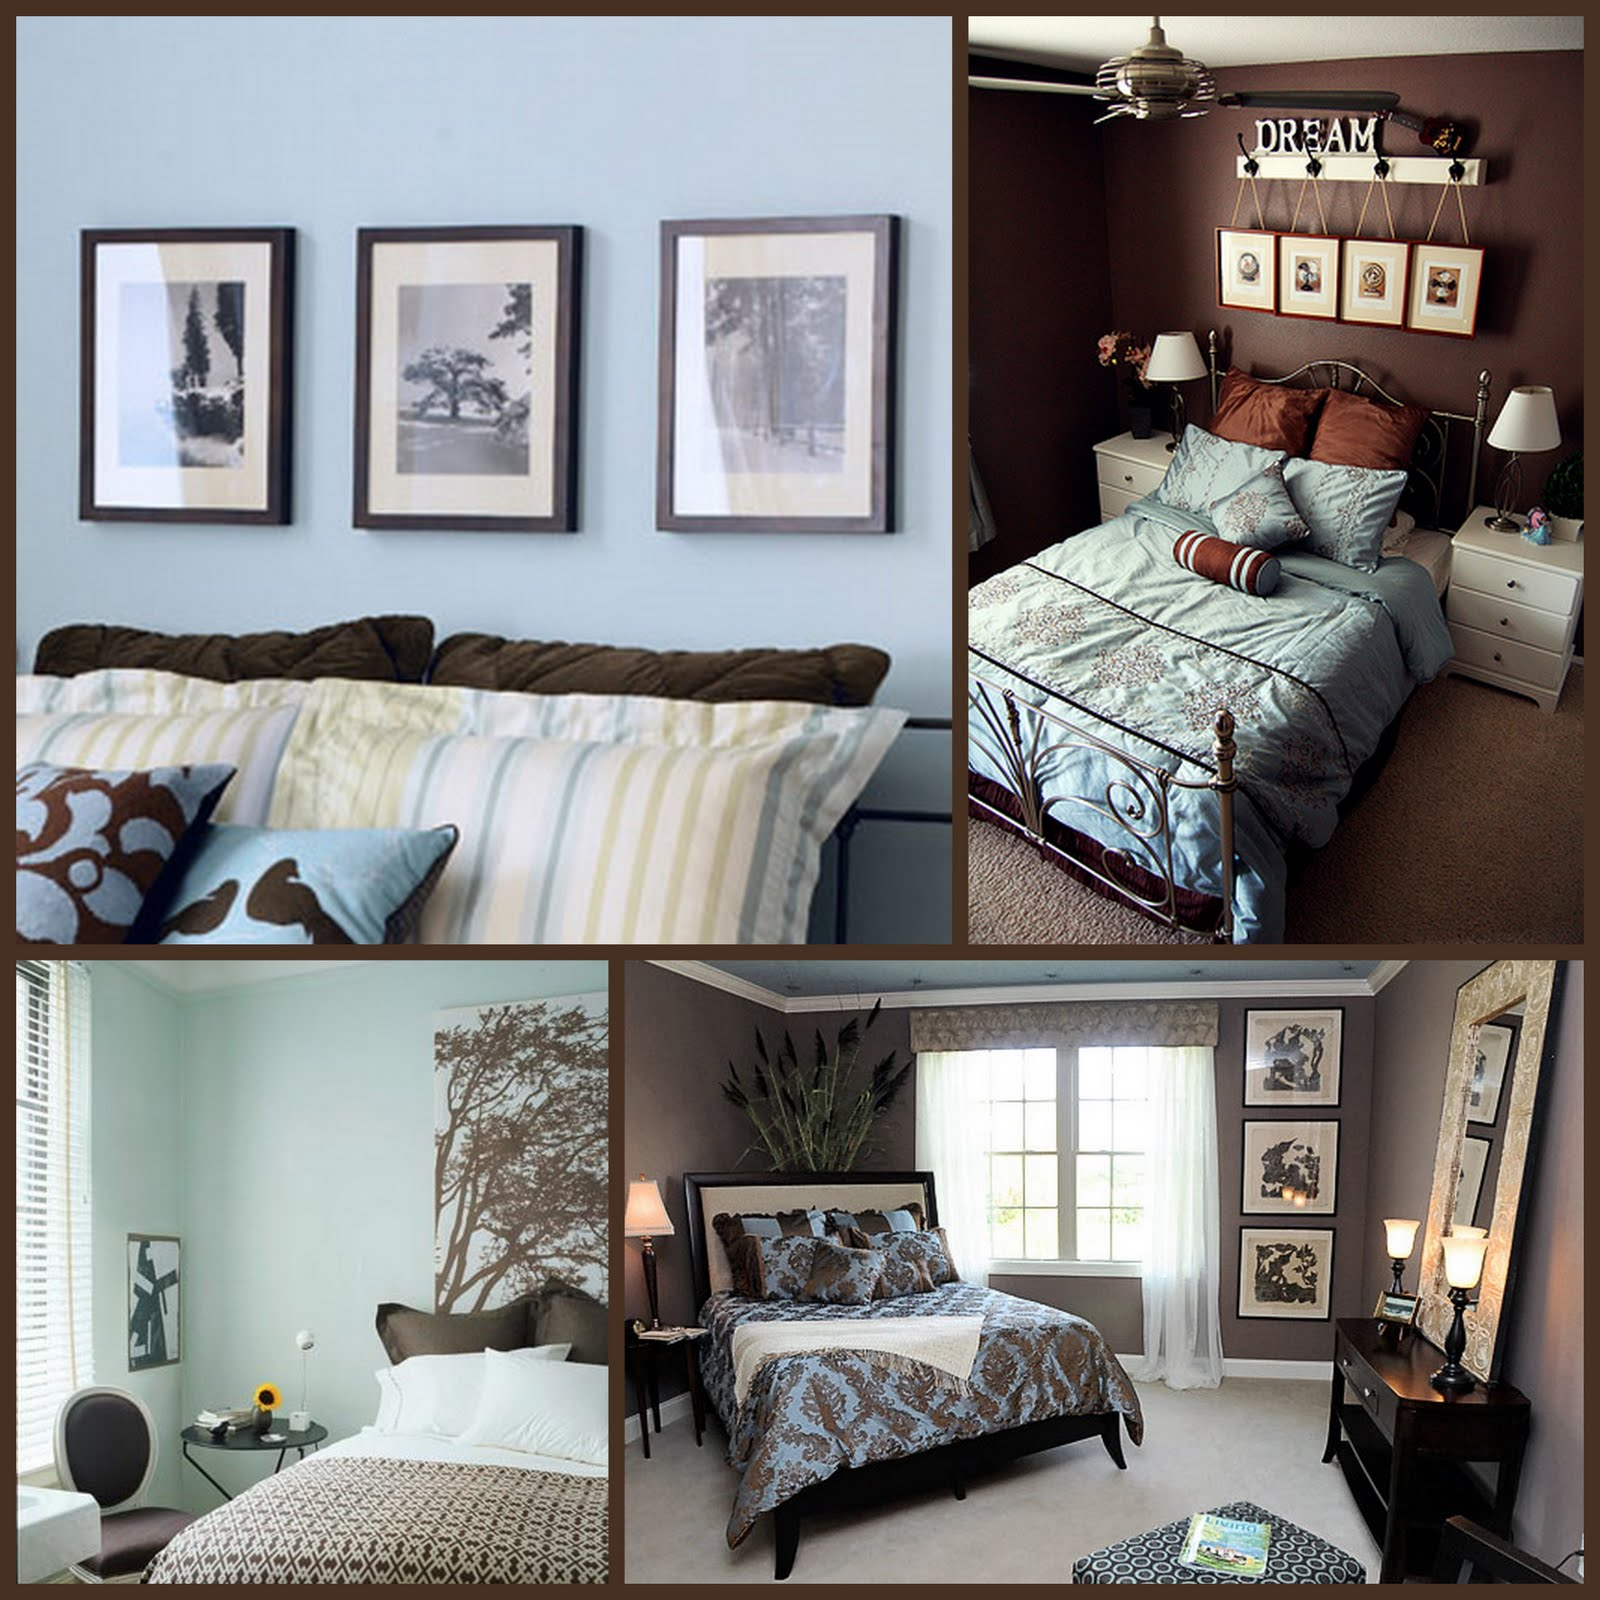 Duck Egg Colour Bedroom Bedroom Built In Cupboards Bedroom Design Ideas For Teenage Girls 2014 Bedroom Artwork Ideas: Pinterest €� The World's Catalog Of Ideas